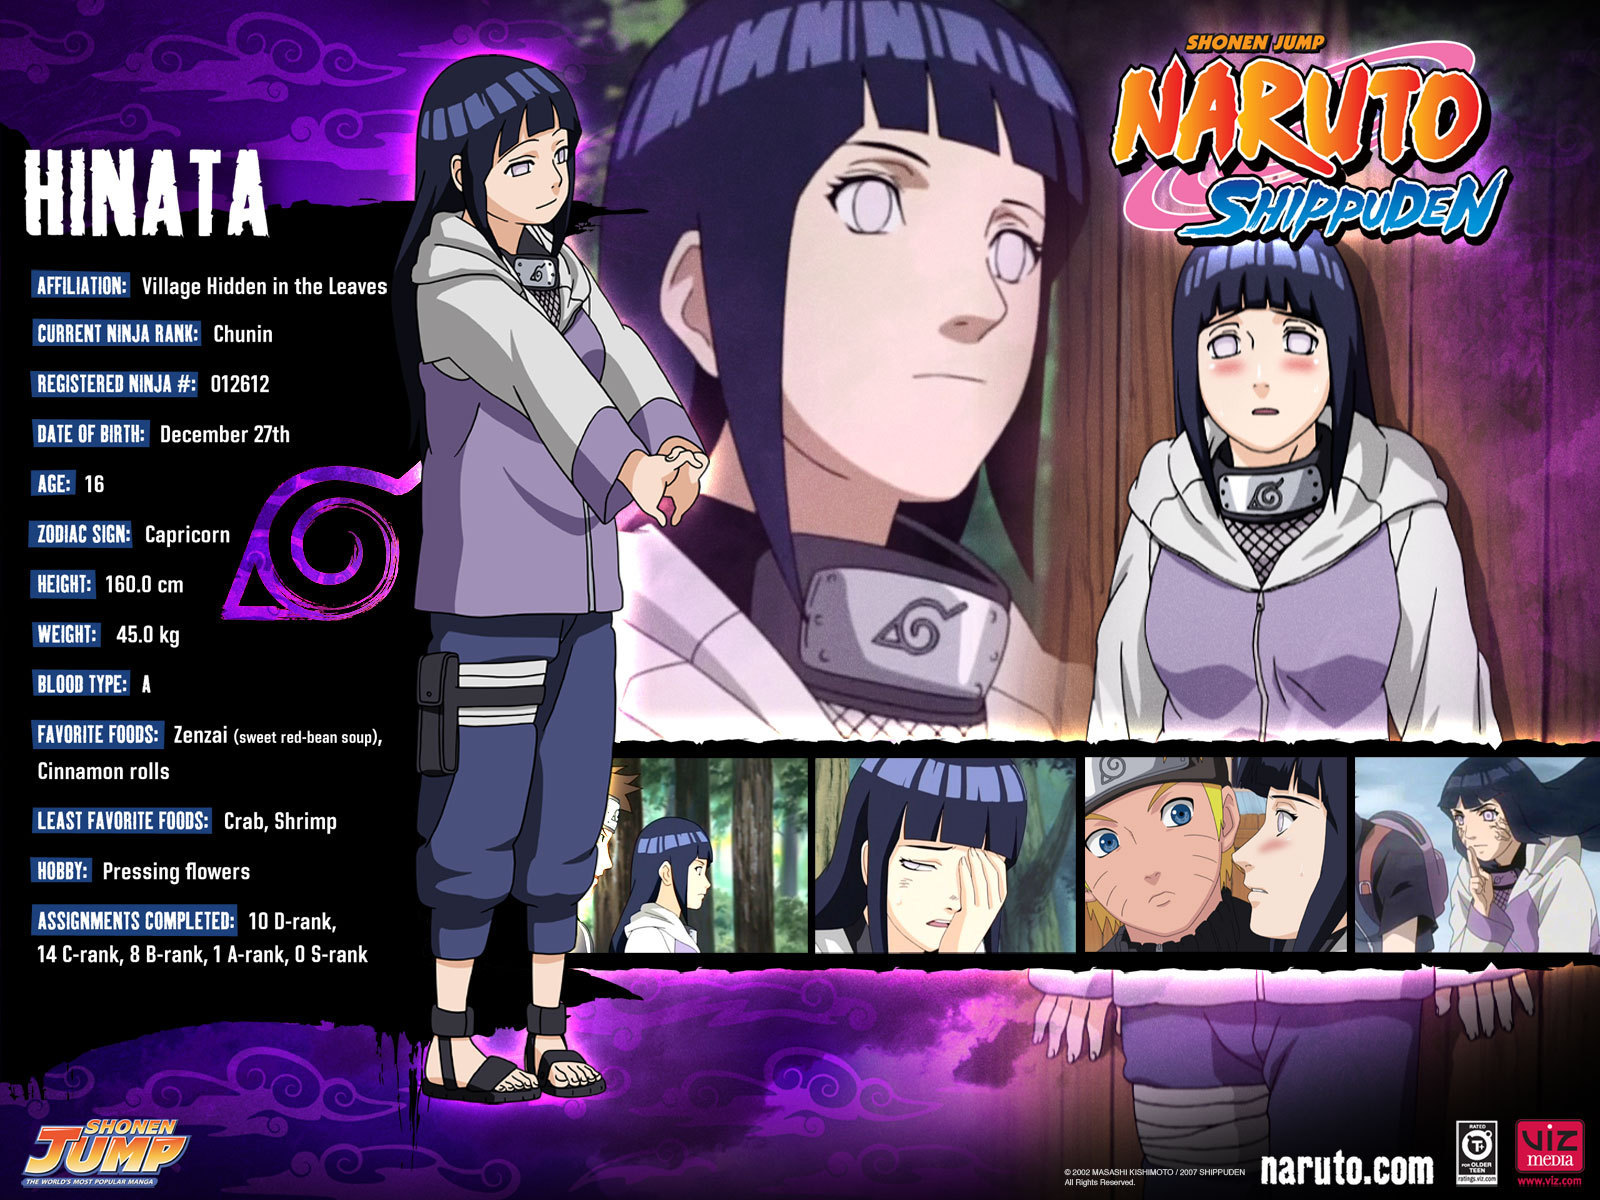 Naruto Shippuden Wallpaper > Naruto Wallpaper is a hi res Wallpaper ...